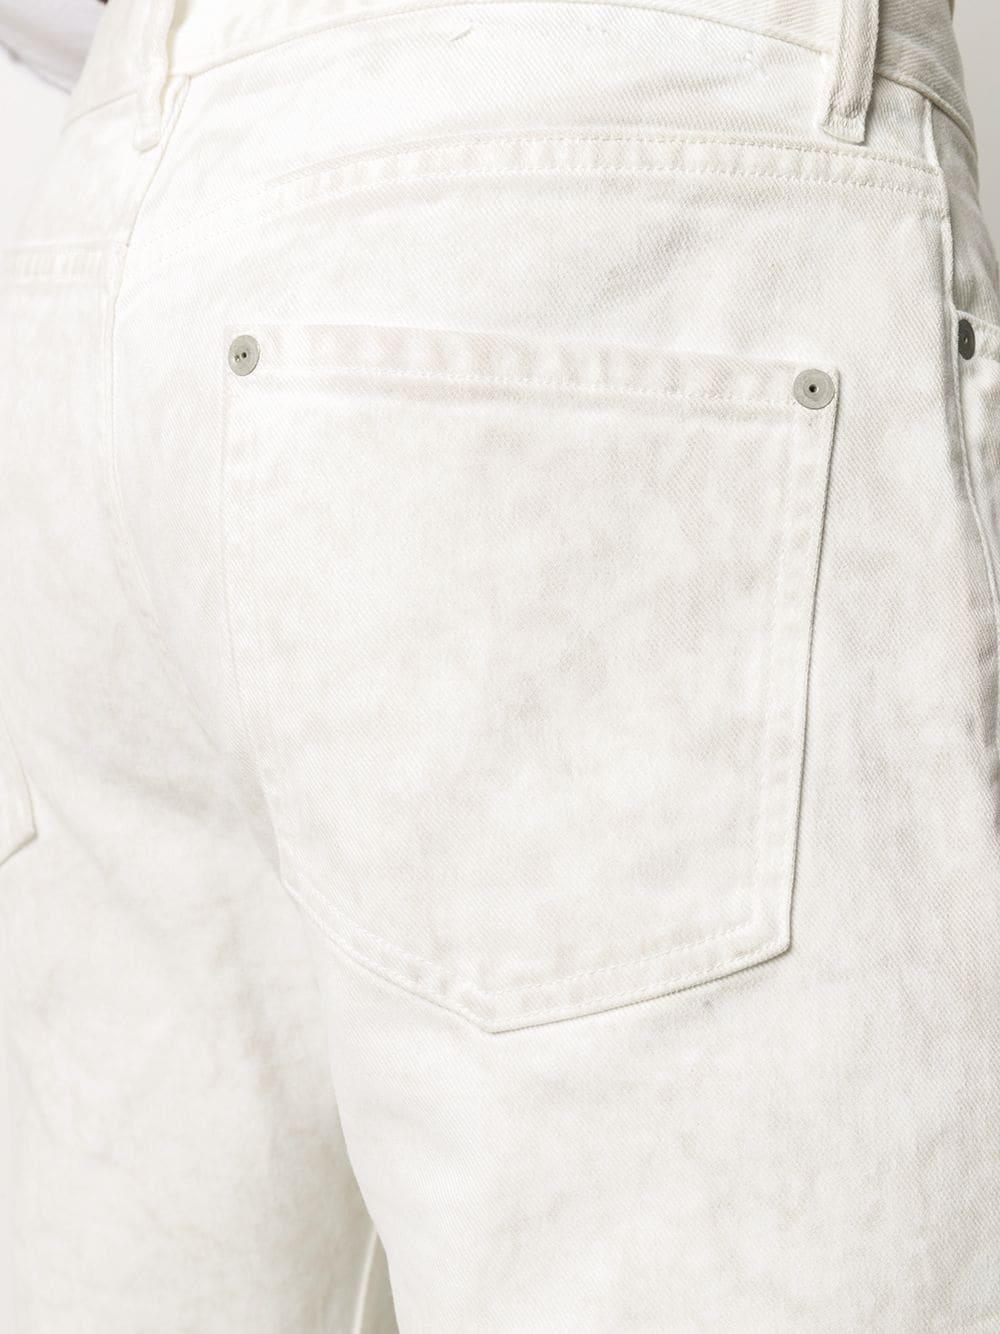 Maison Margiela | Maison Margiela джинсы кроя слим | Clouty